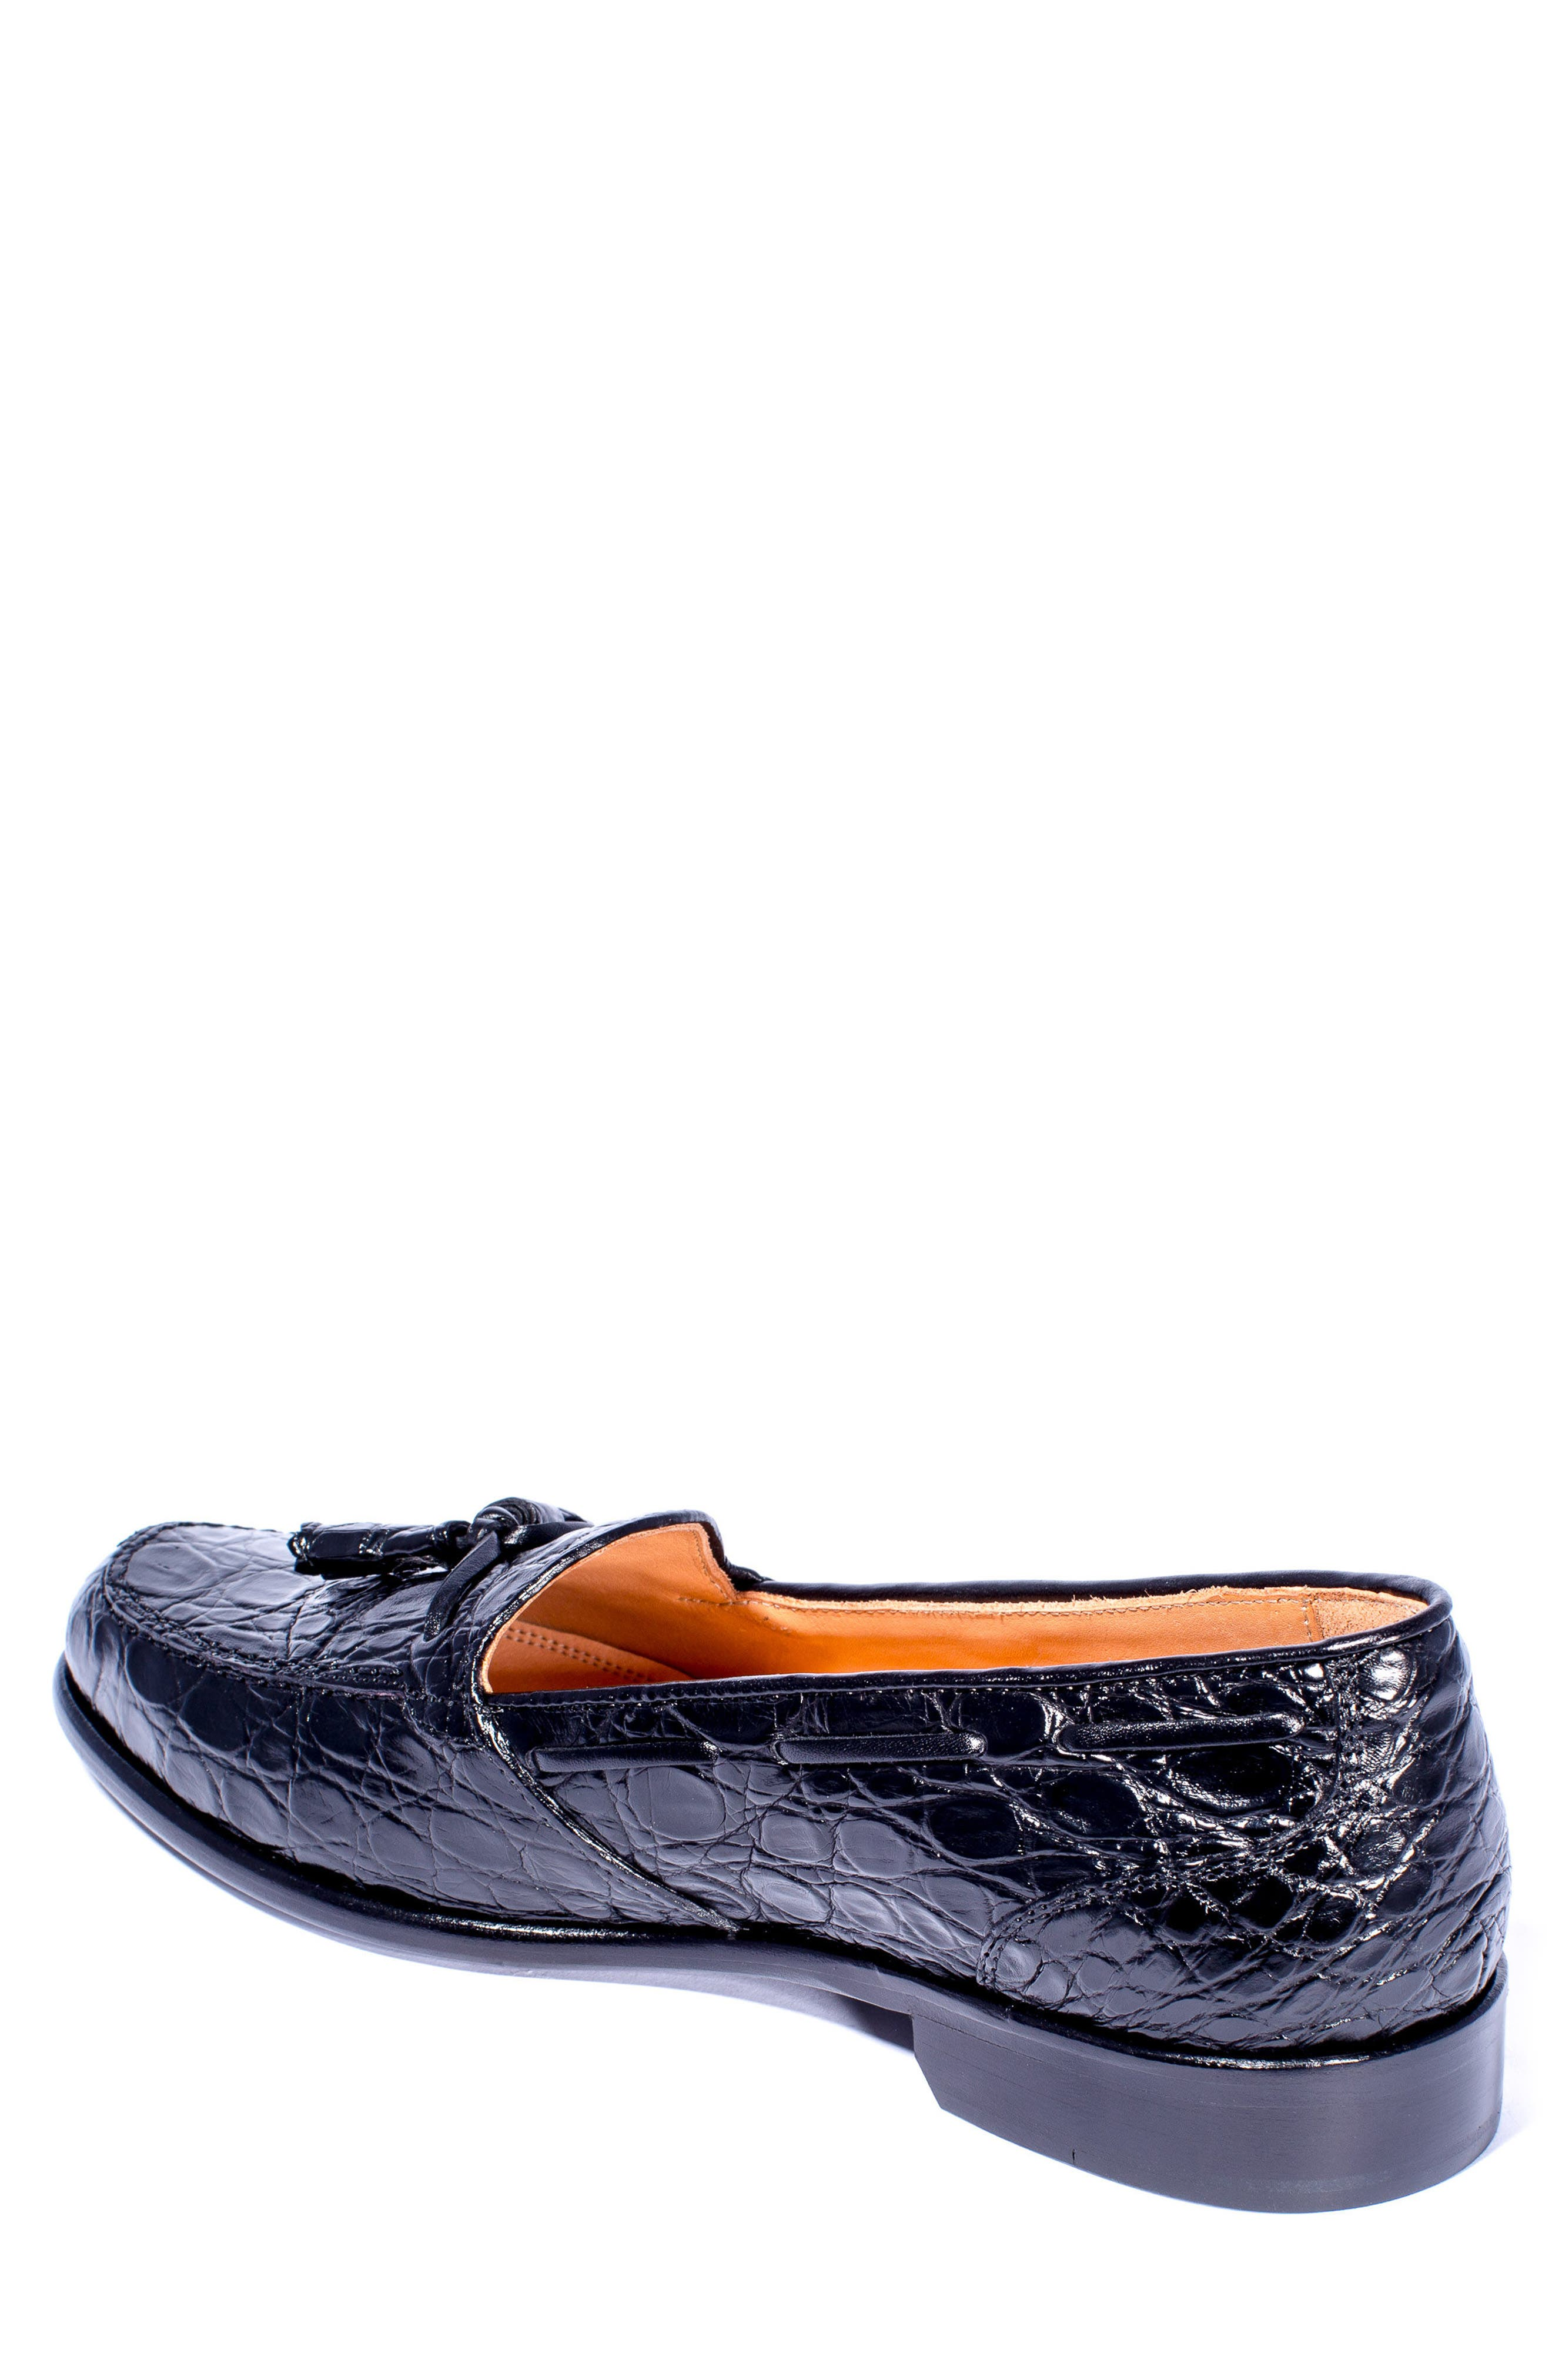 Franco Tassel Exotic Leather Loafer,                             Alternate thumbnail 3, color,